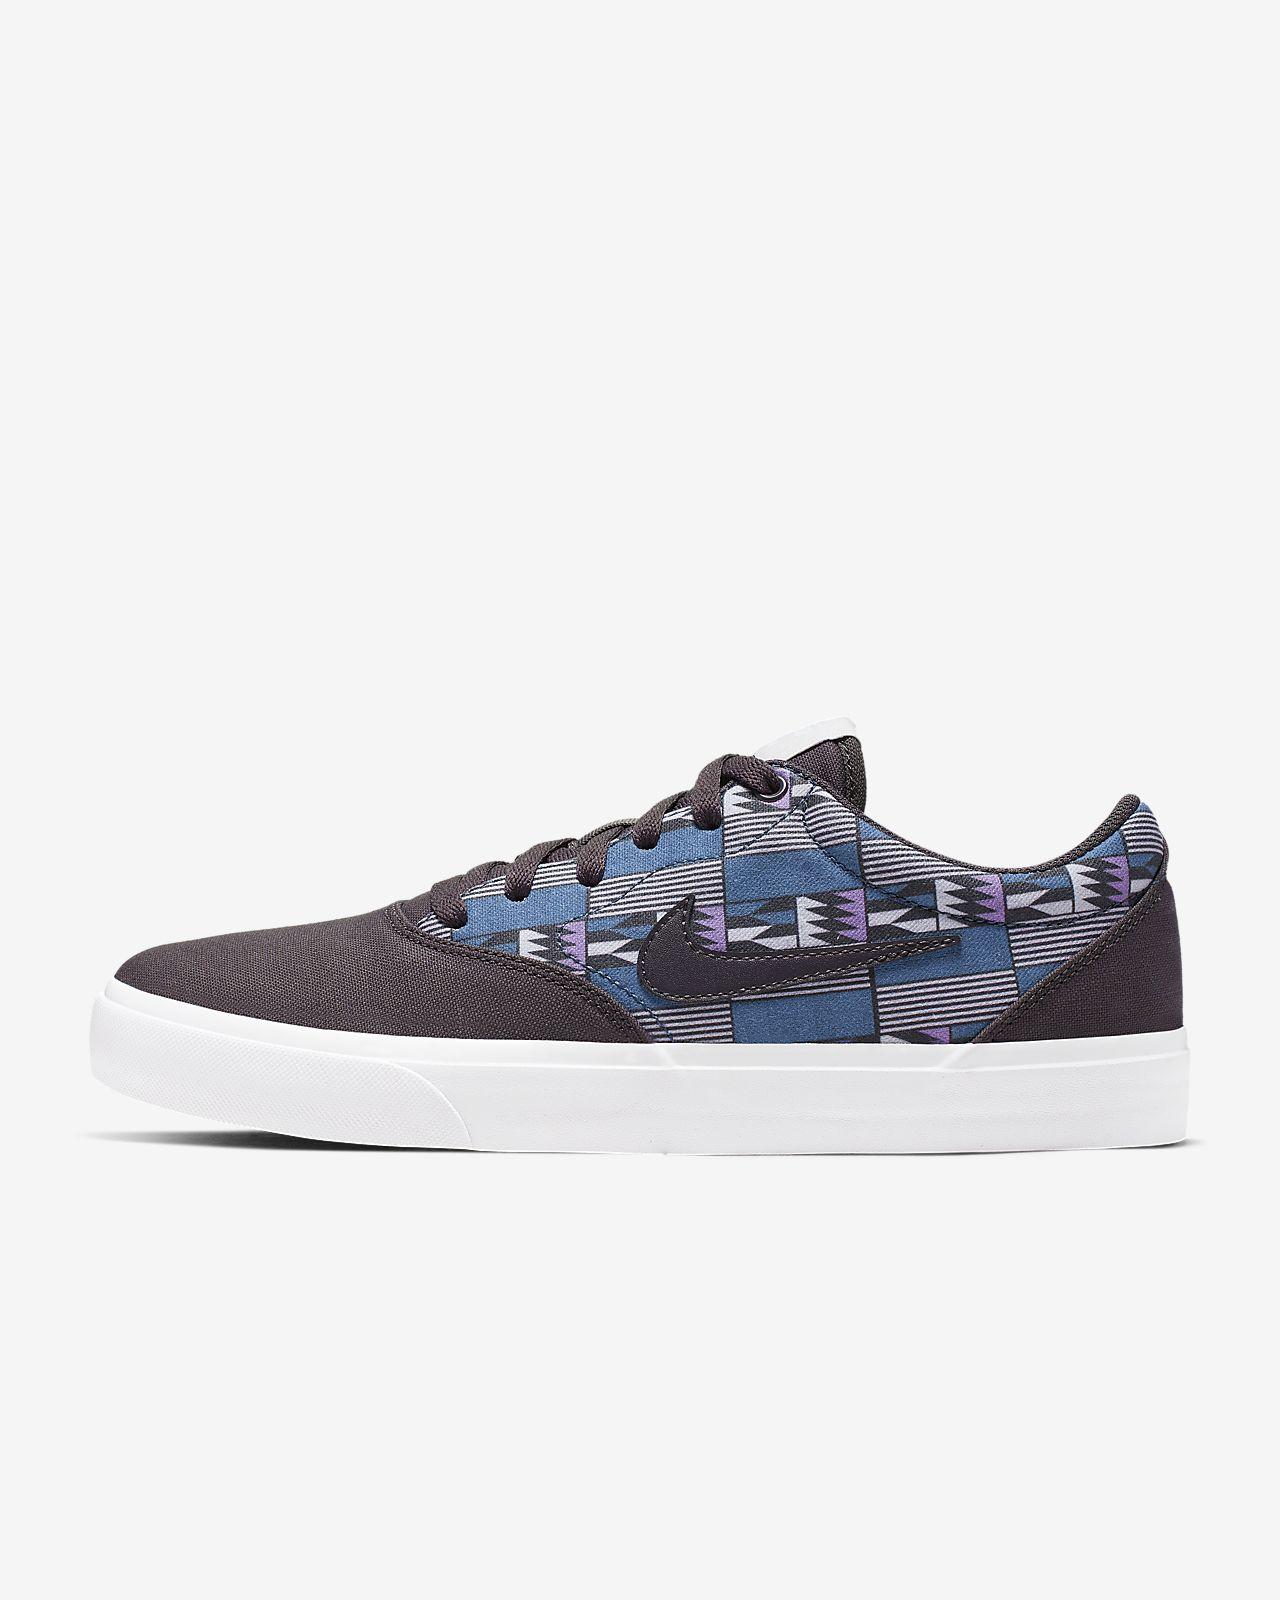 Calzado de skateboarding Nike SB Charge Premium